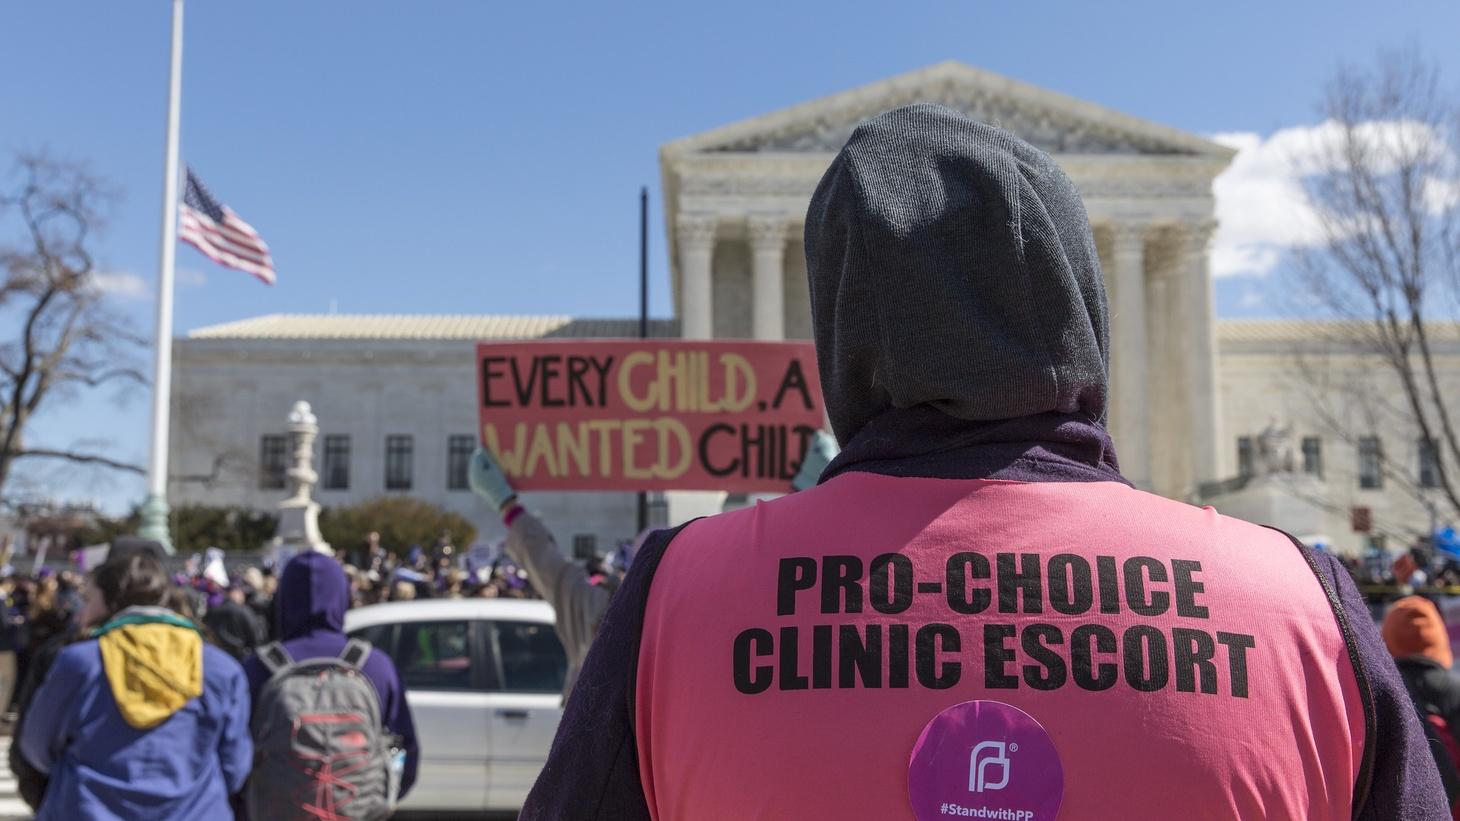 Pro-choice Clinic Escort